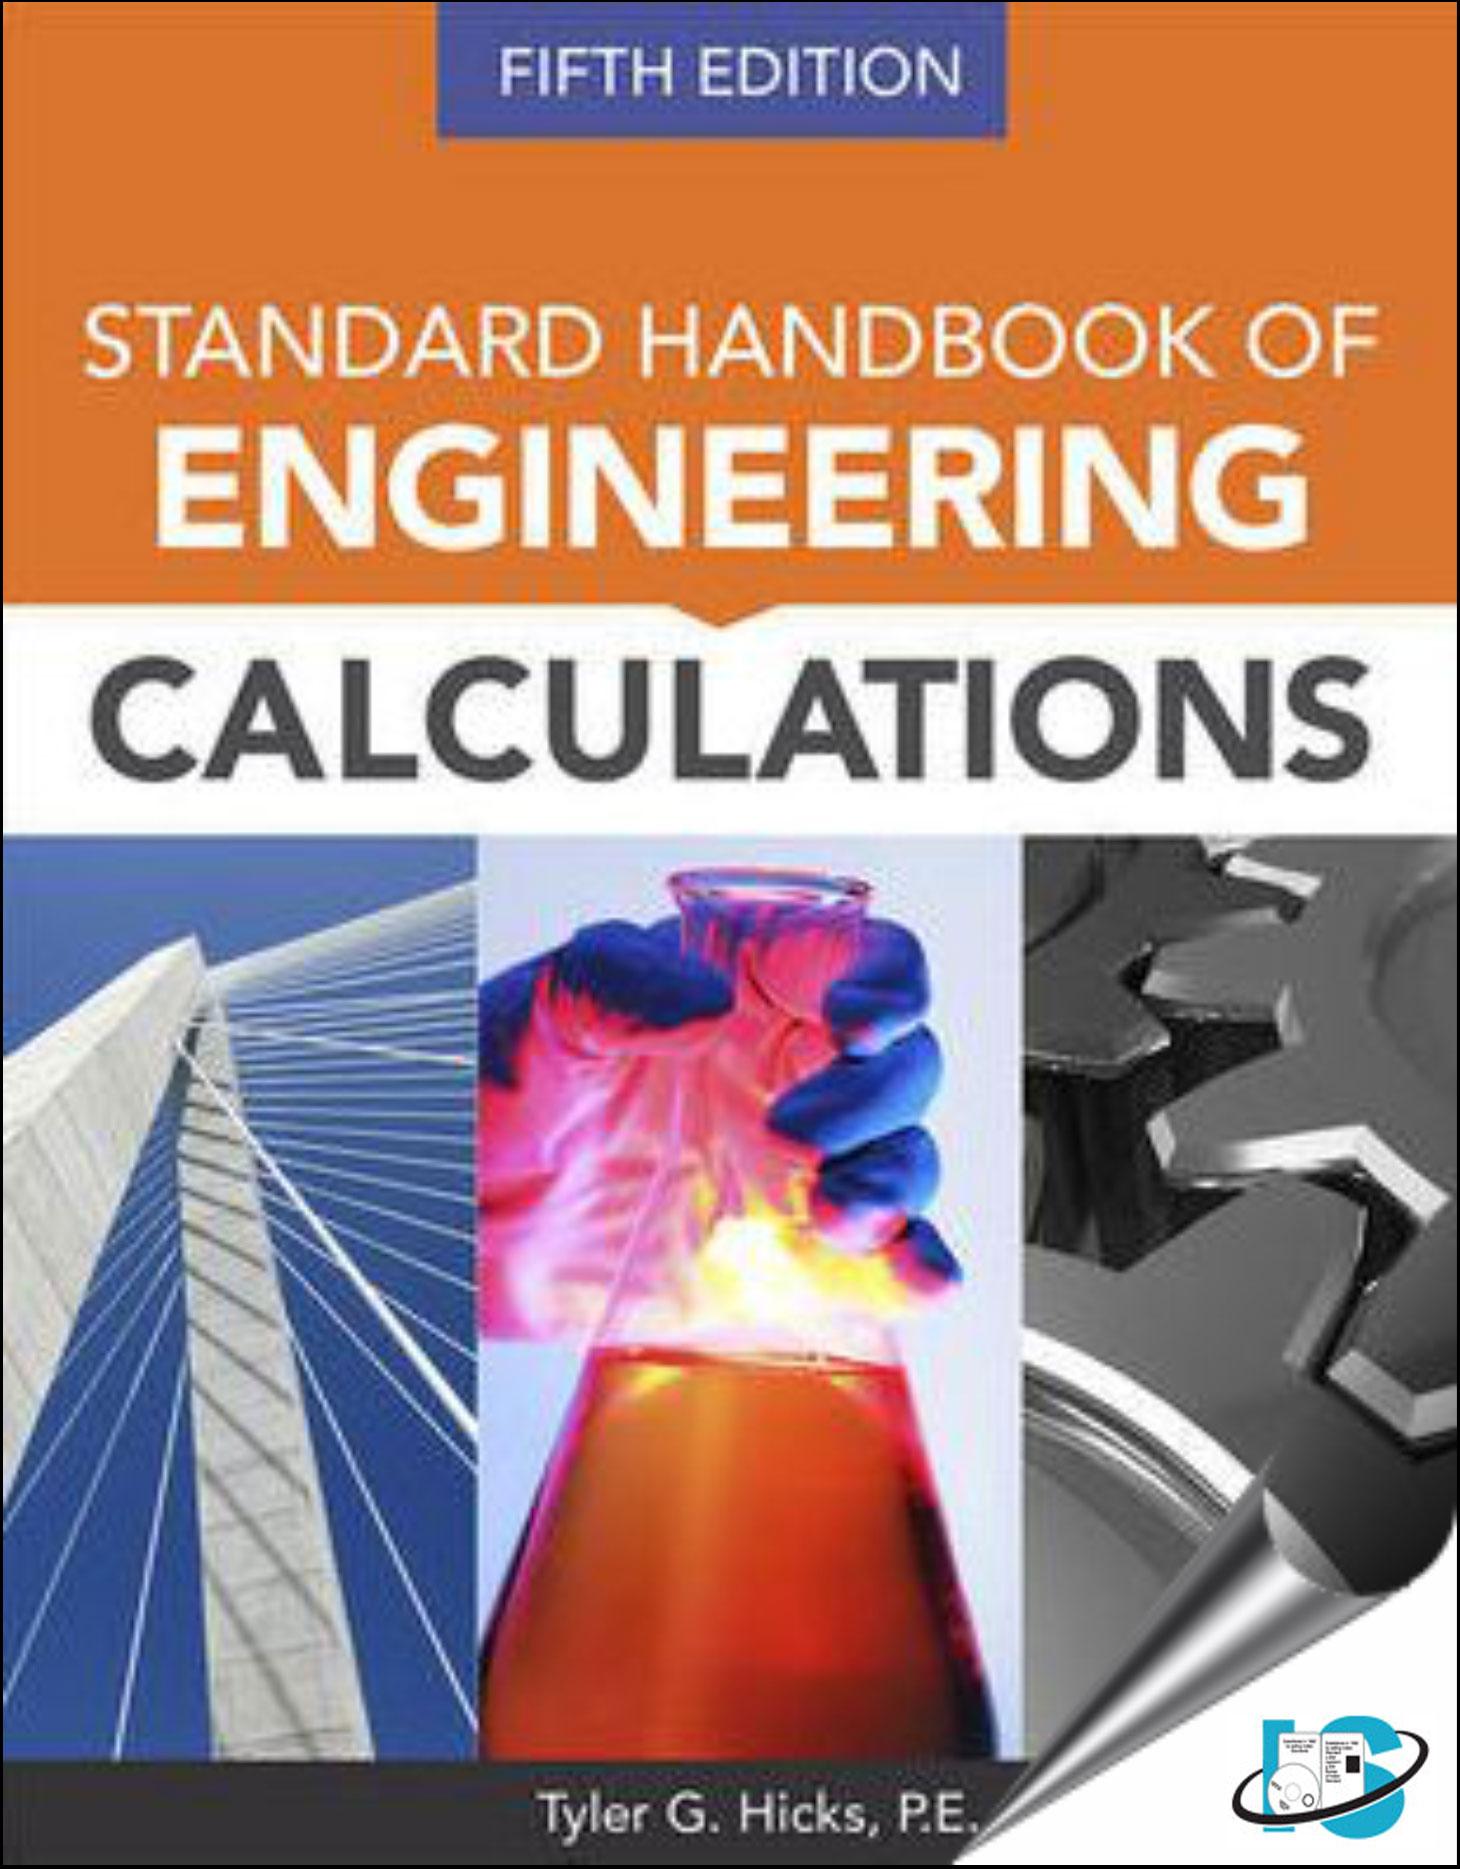 Standard handbook of engineering calculations malestrom